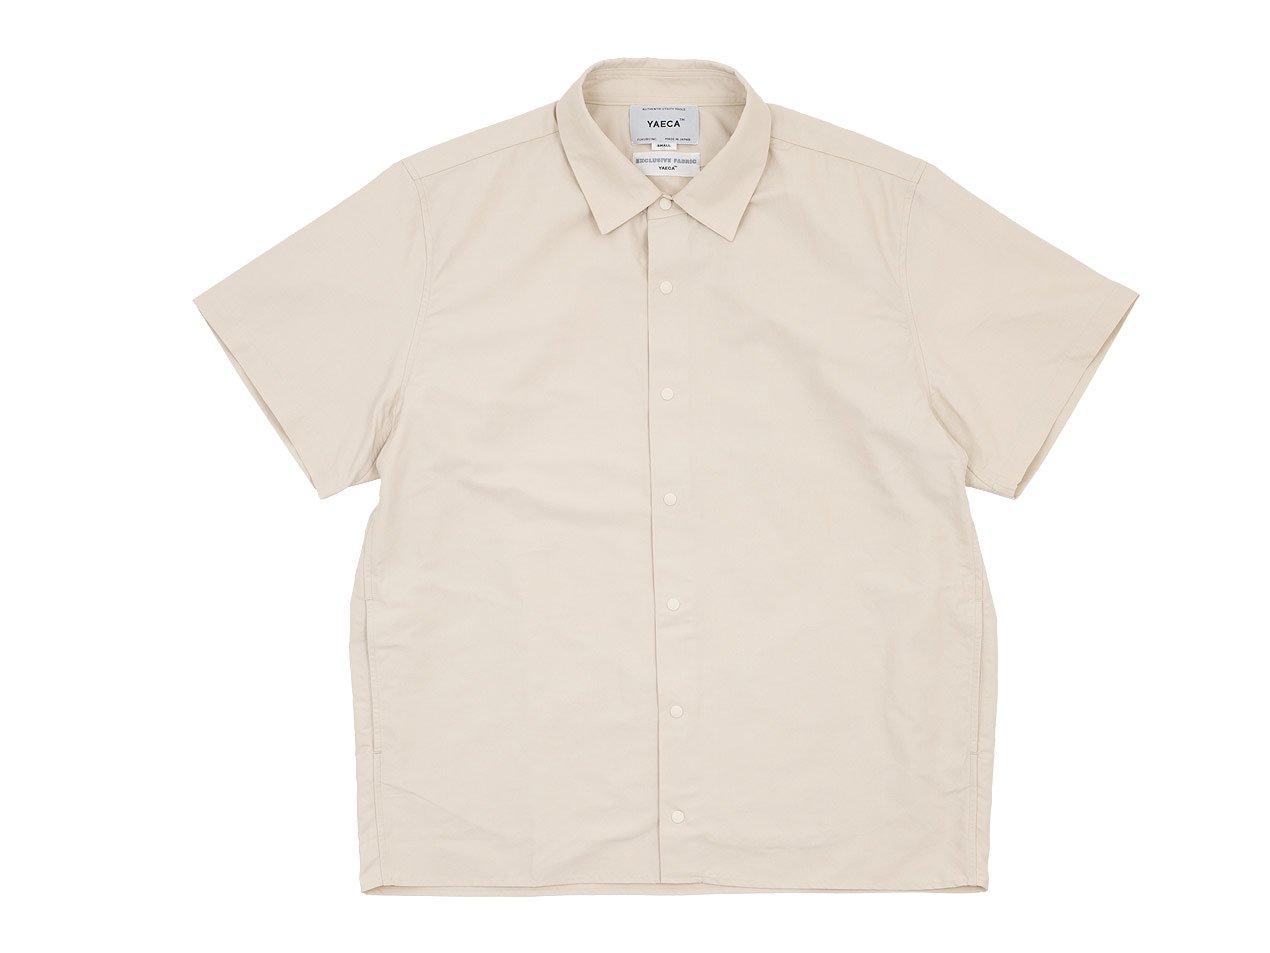 YAECA コンフォートシャツ 半袖 BEIGE 〔メンズ〕